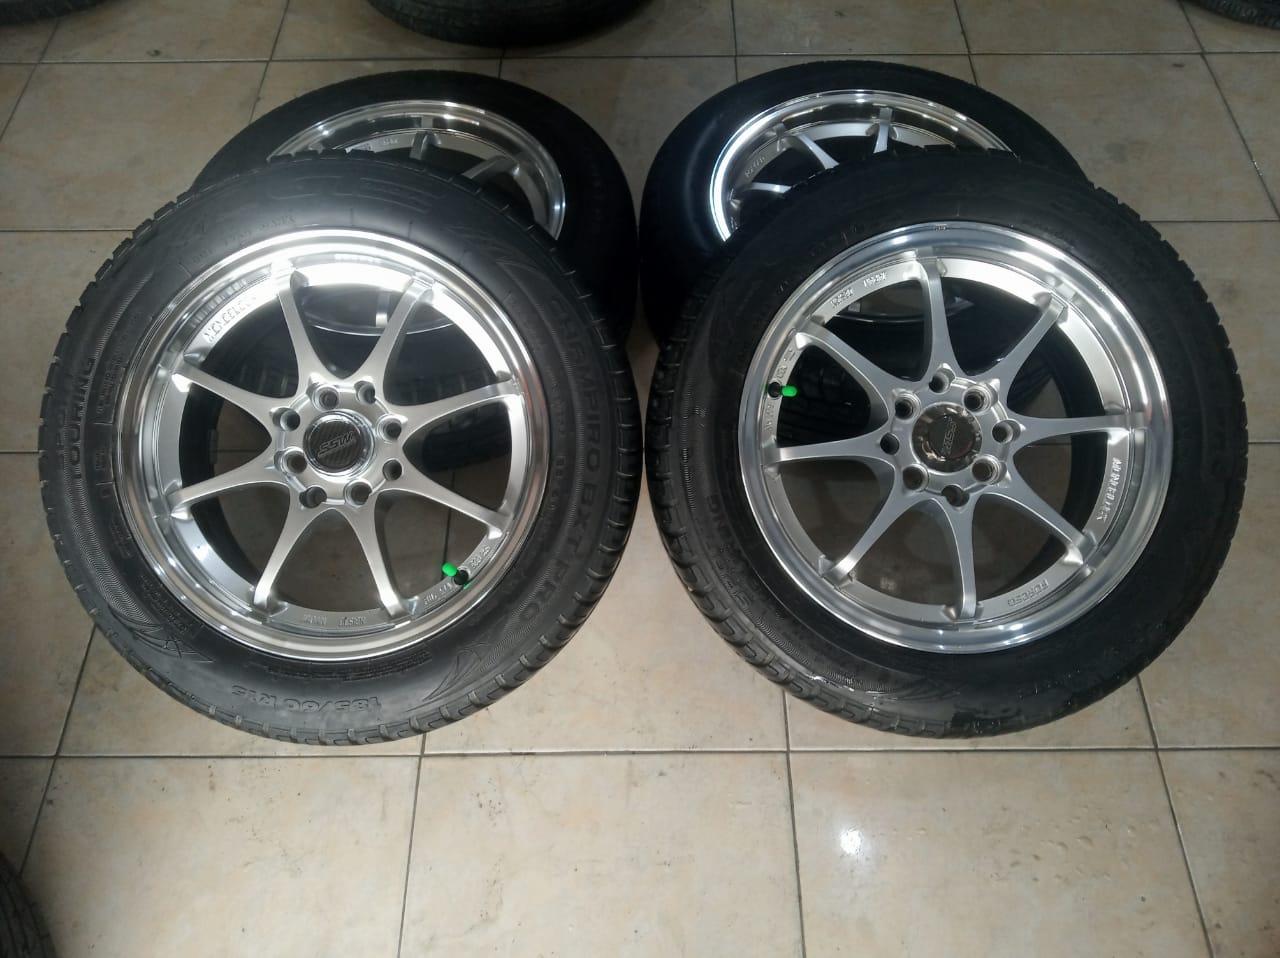 VELG RACING CE28 +BAN GT 185 60 R15